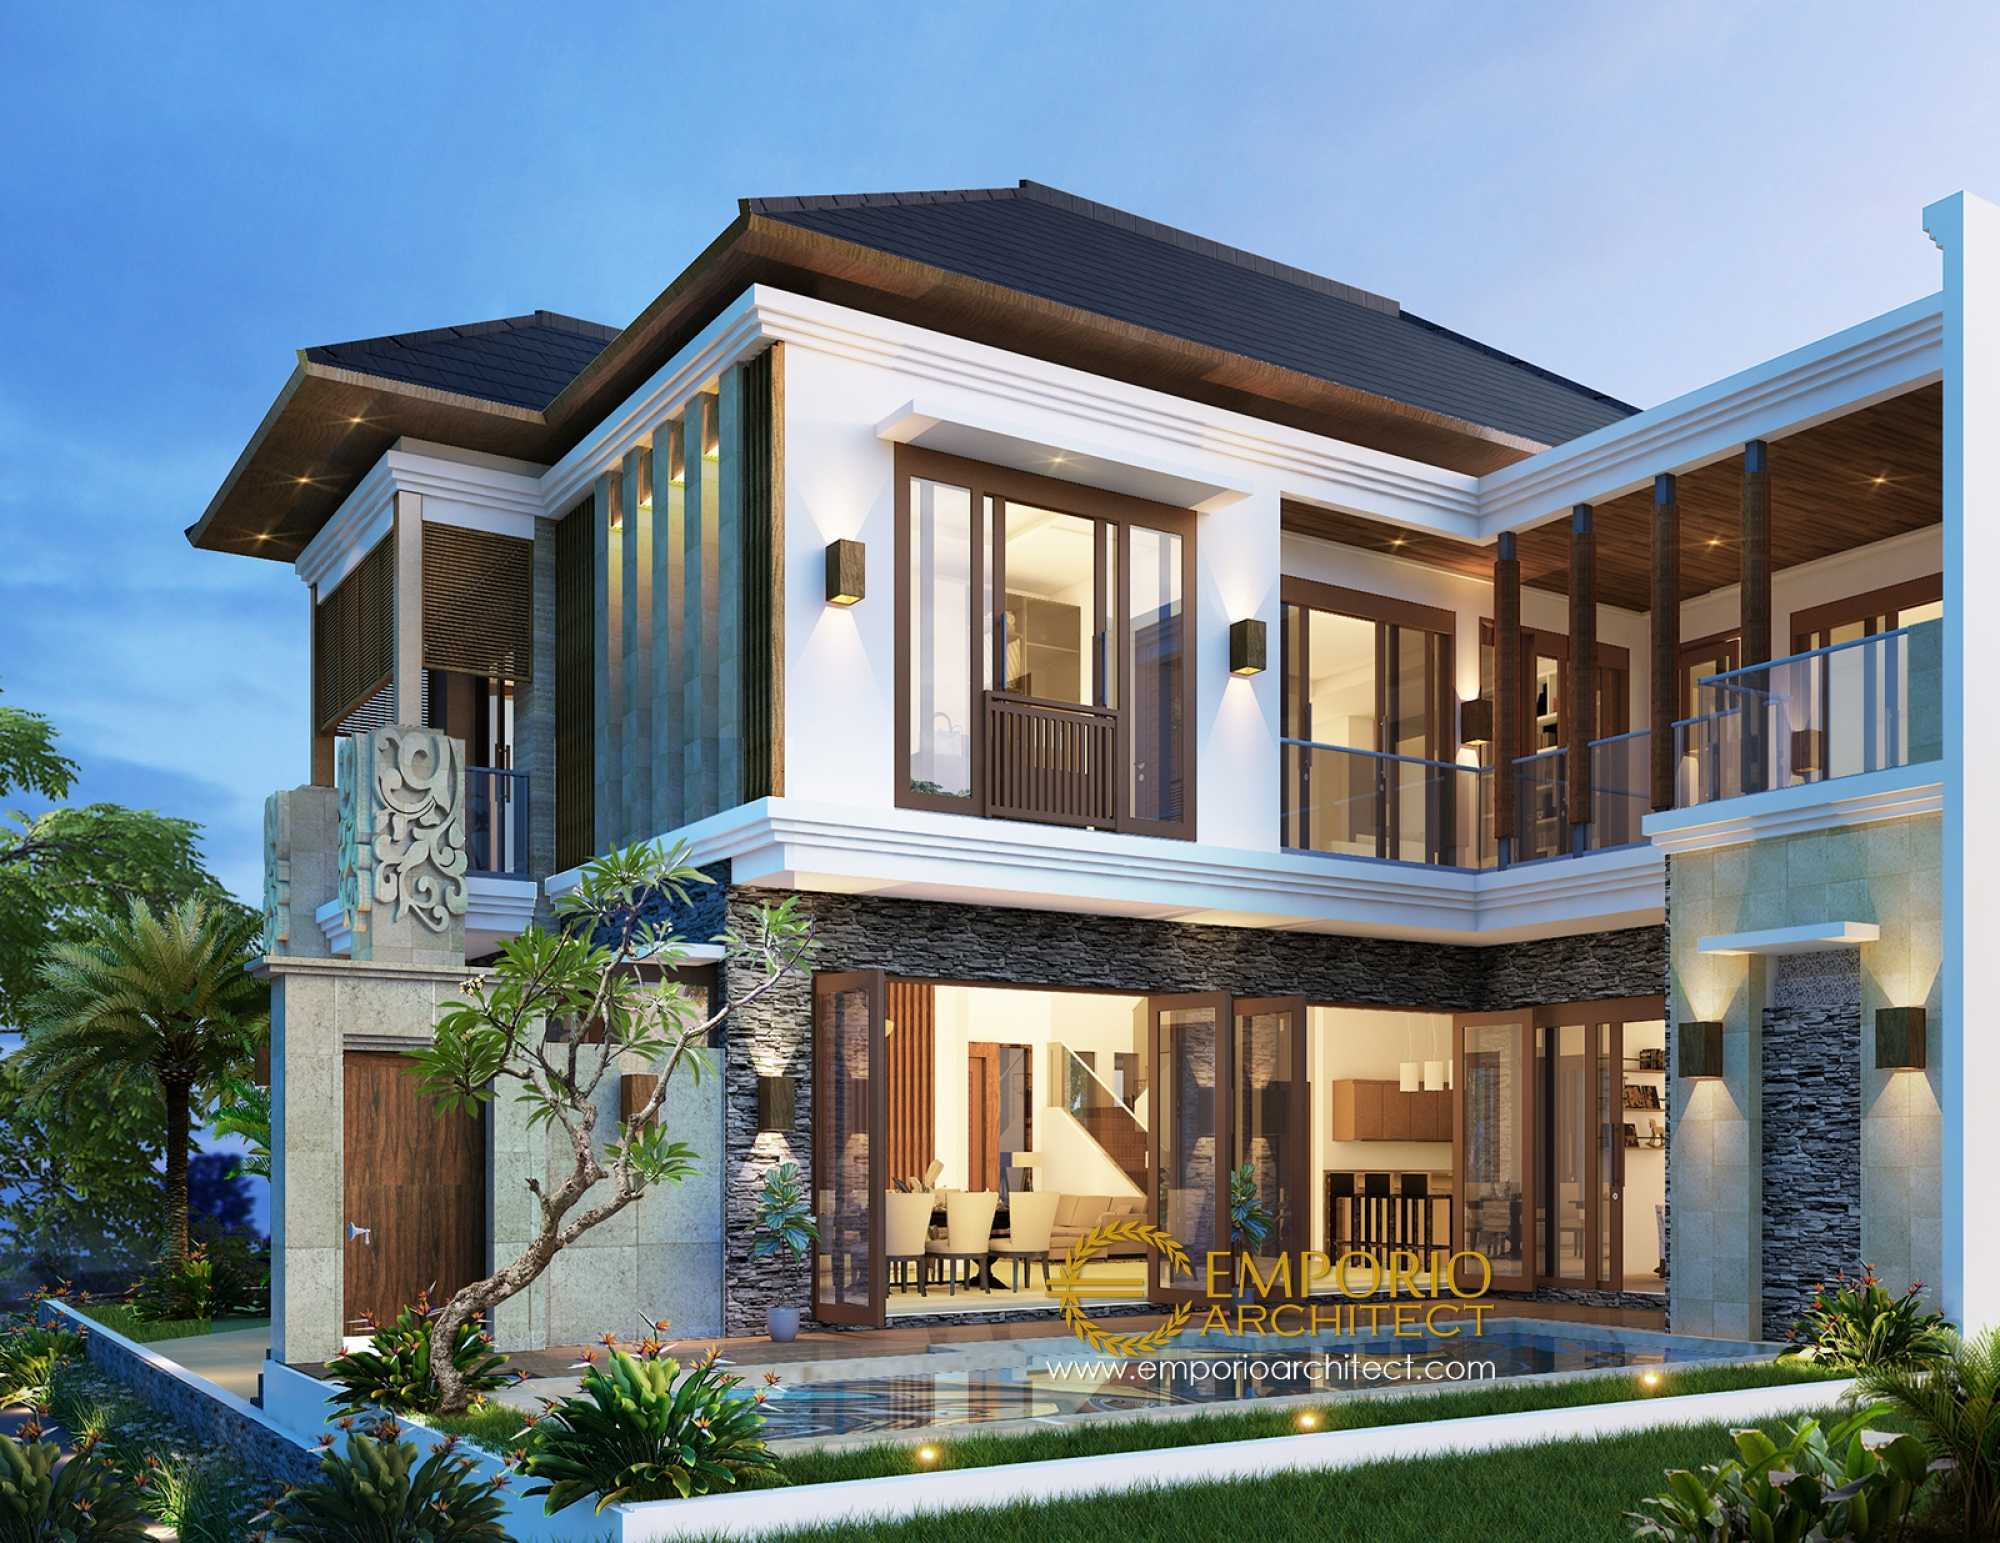 Emporio Architect Desain Rumah Villa Bali Tropis 390 @ Bekasi Bekasi, Kota Bks, Jawa Barat, Indonesia Bekasi, Kota Bks, Jawa Barat, Indonesia Emporio-Architect-Desain-Rumah-Villa-Bali-Tropis-390-Bekasi  76847